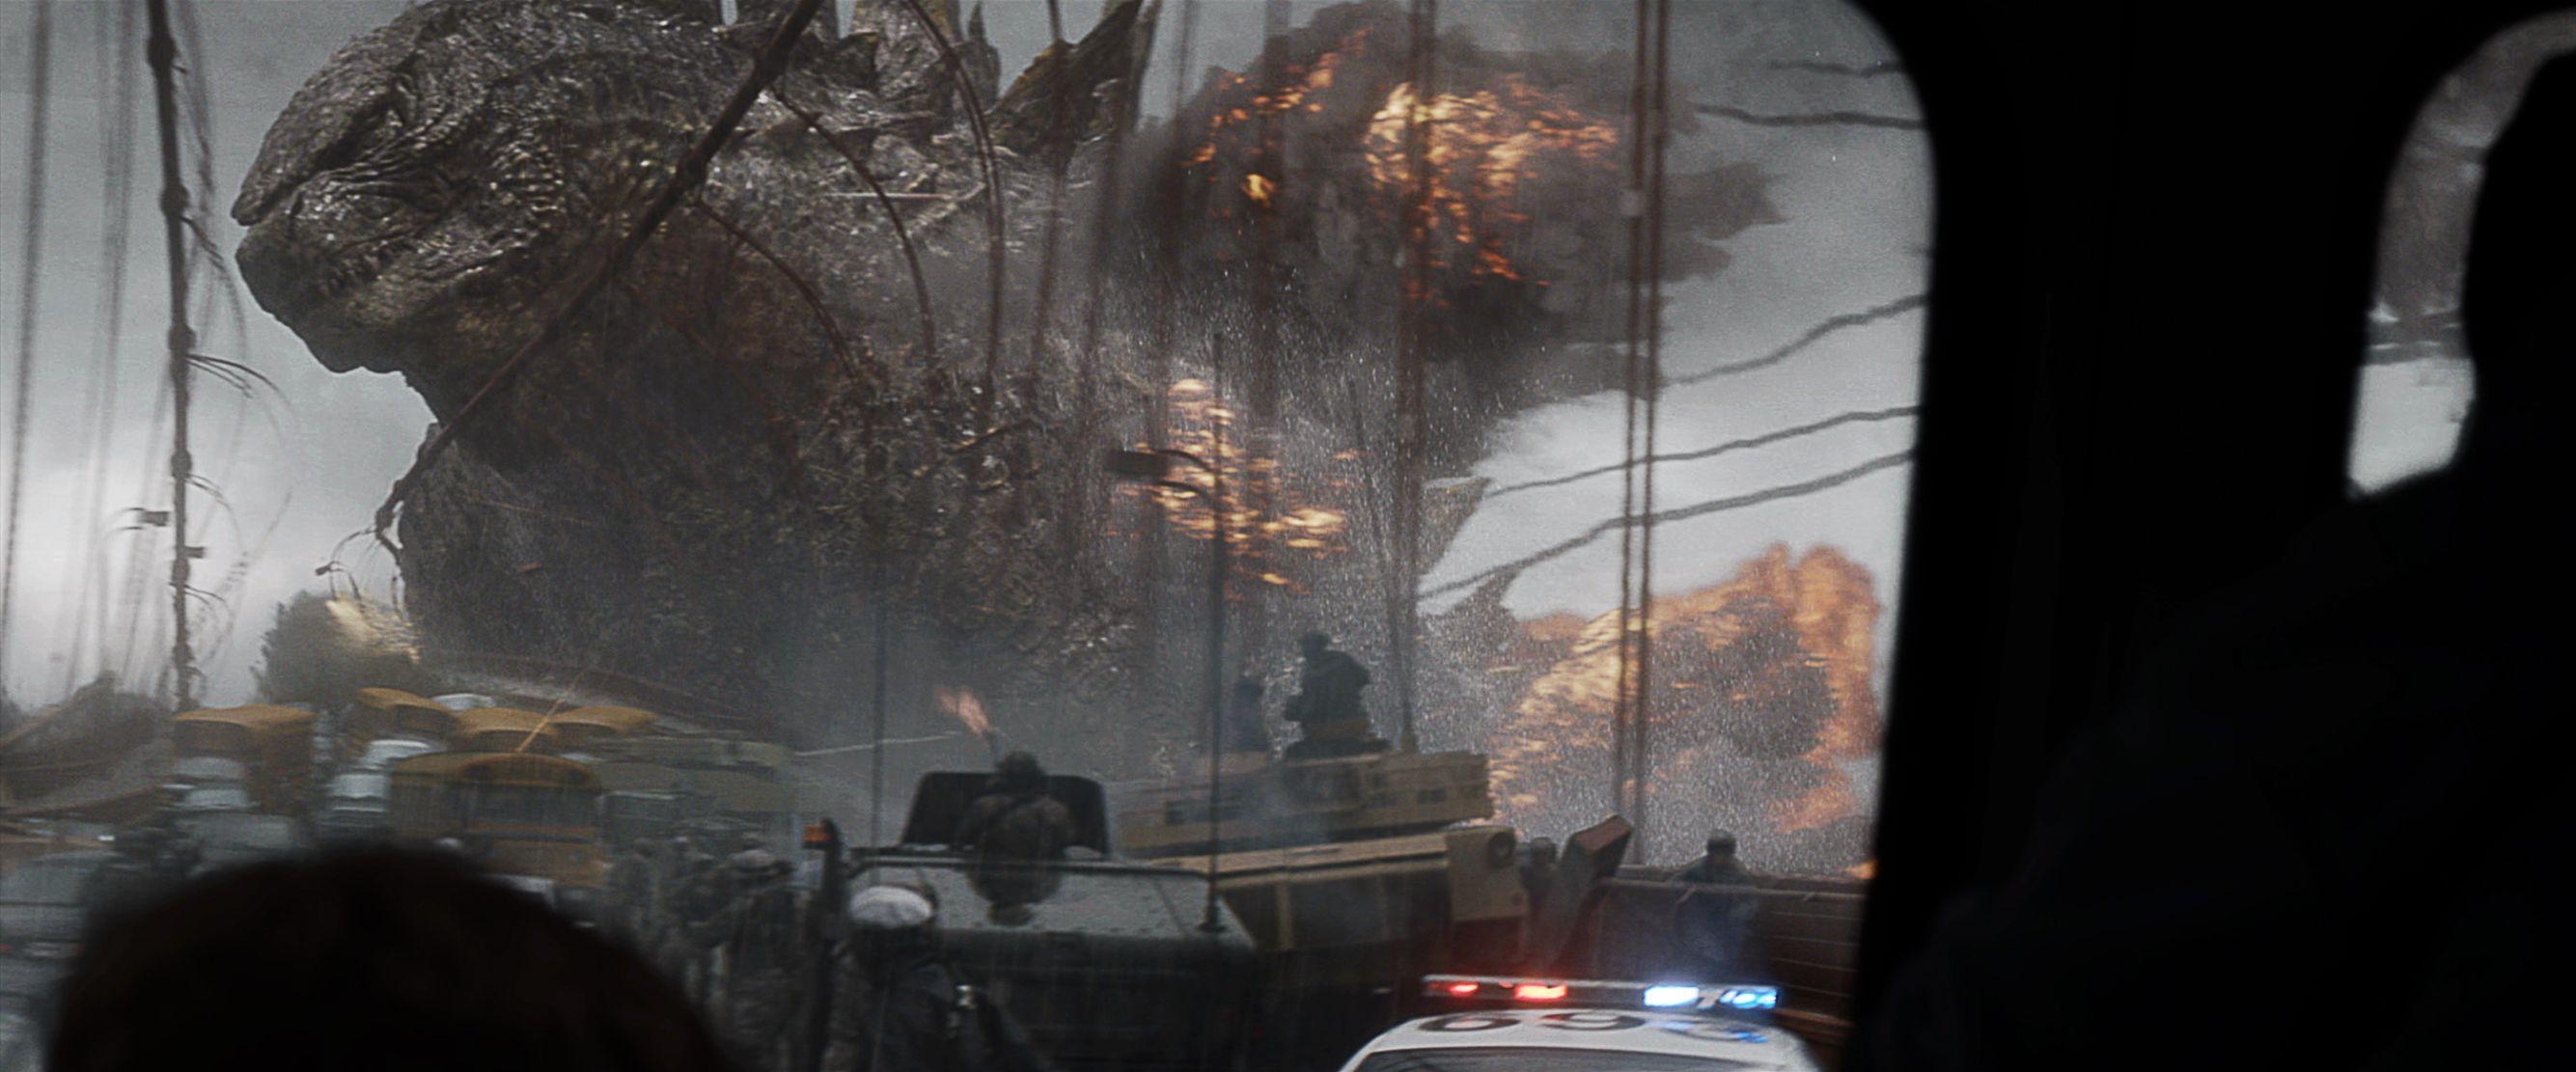 Godzilla 2014 Besetzung